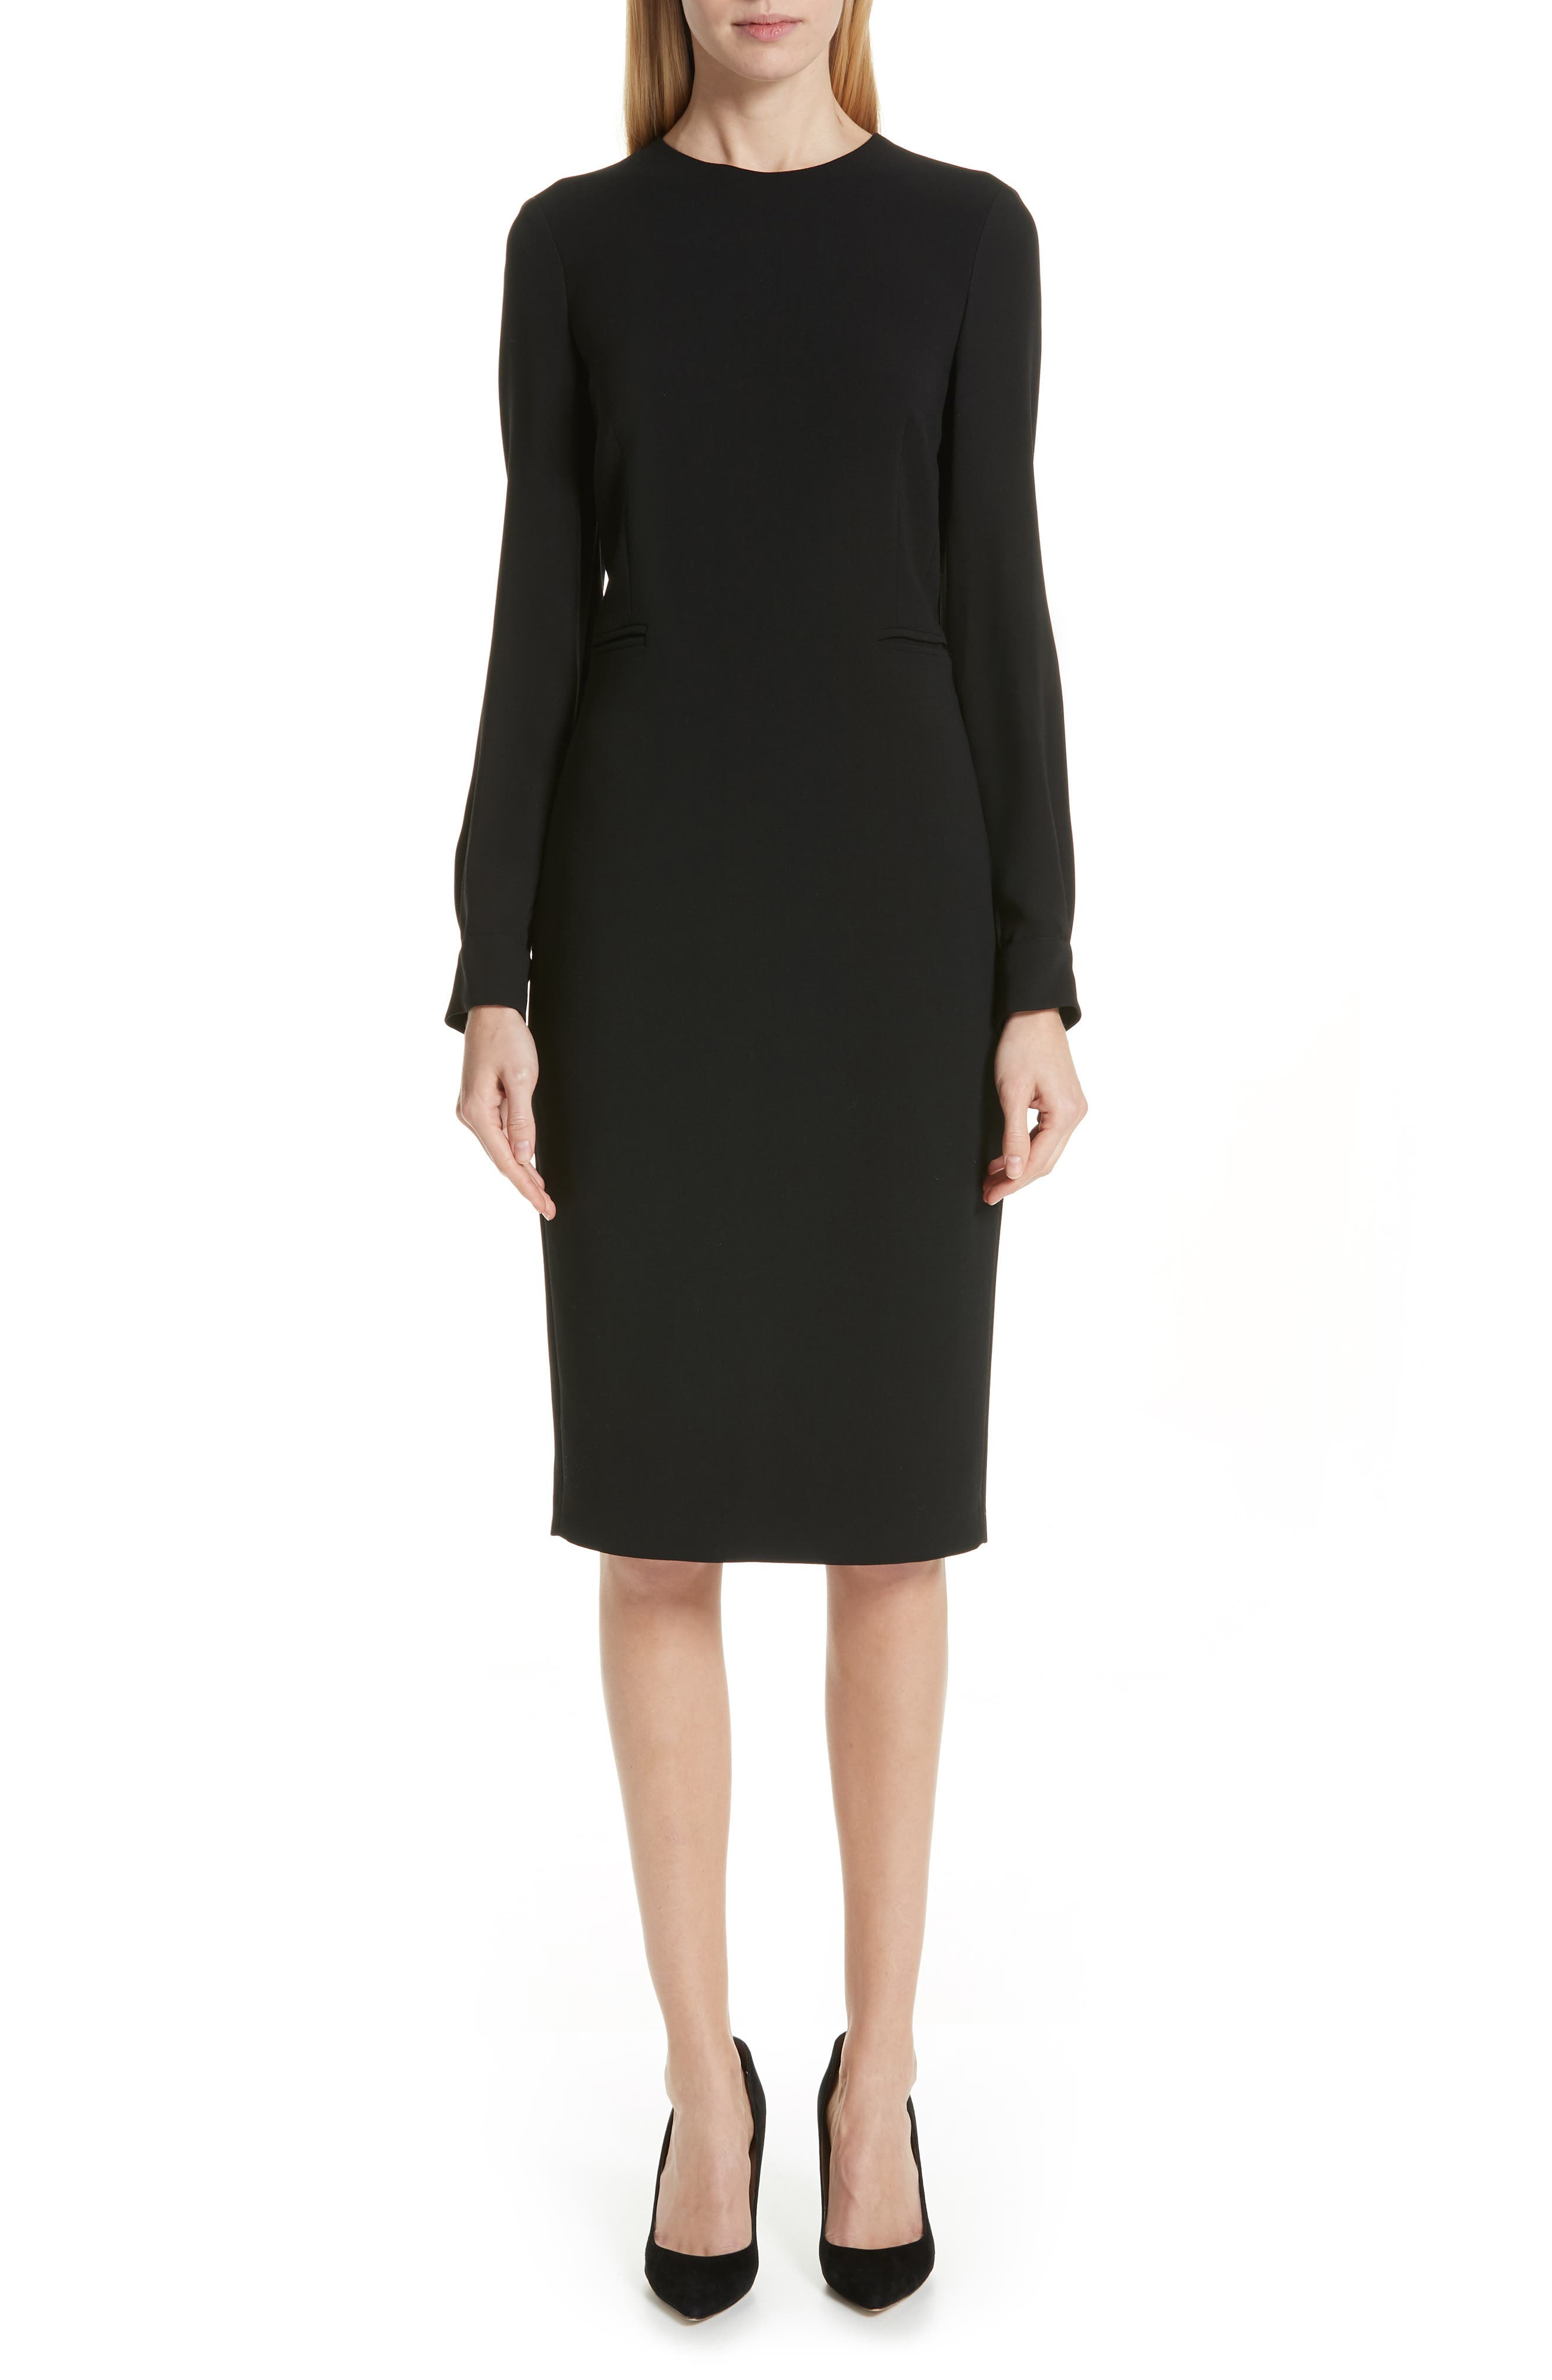 Ottelia Stretch Wool Sheath Dress,                             Main thumbnail 1, color,                             BLACK